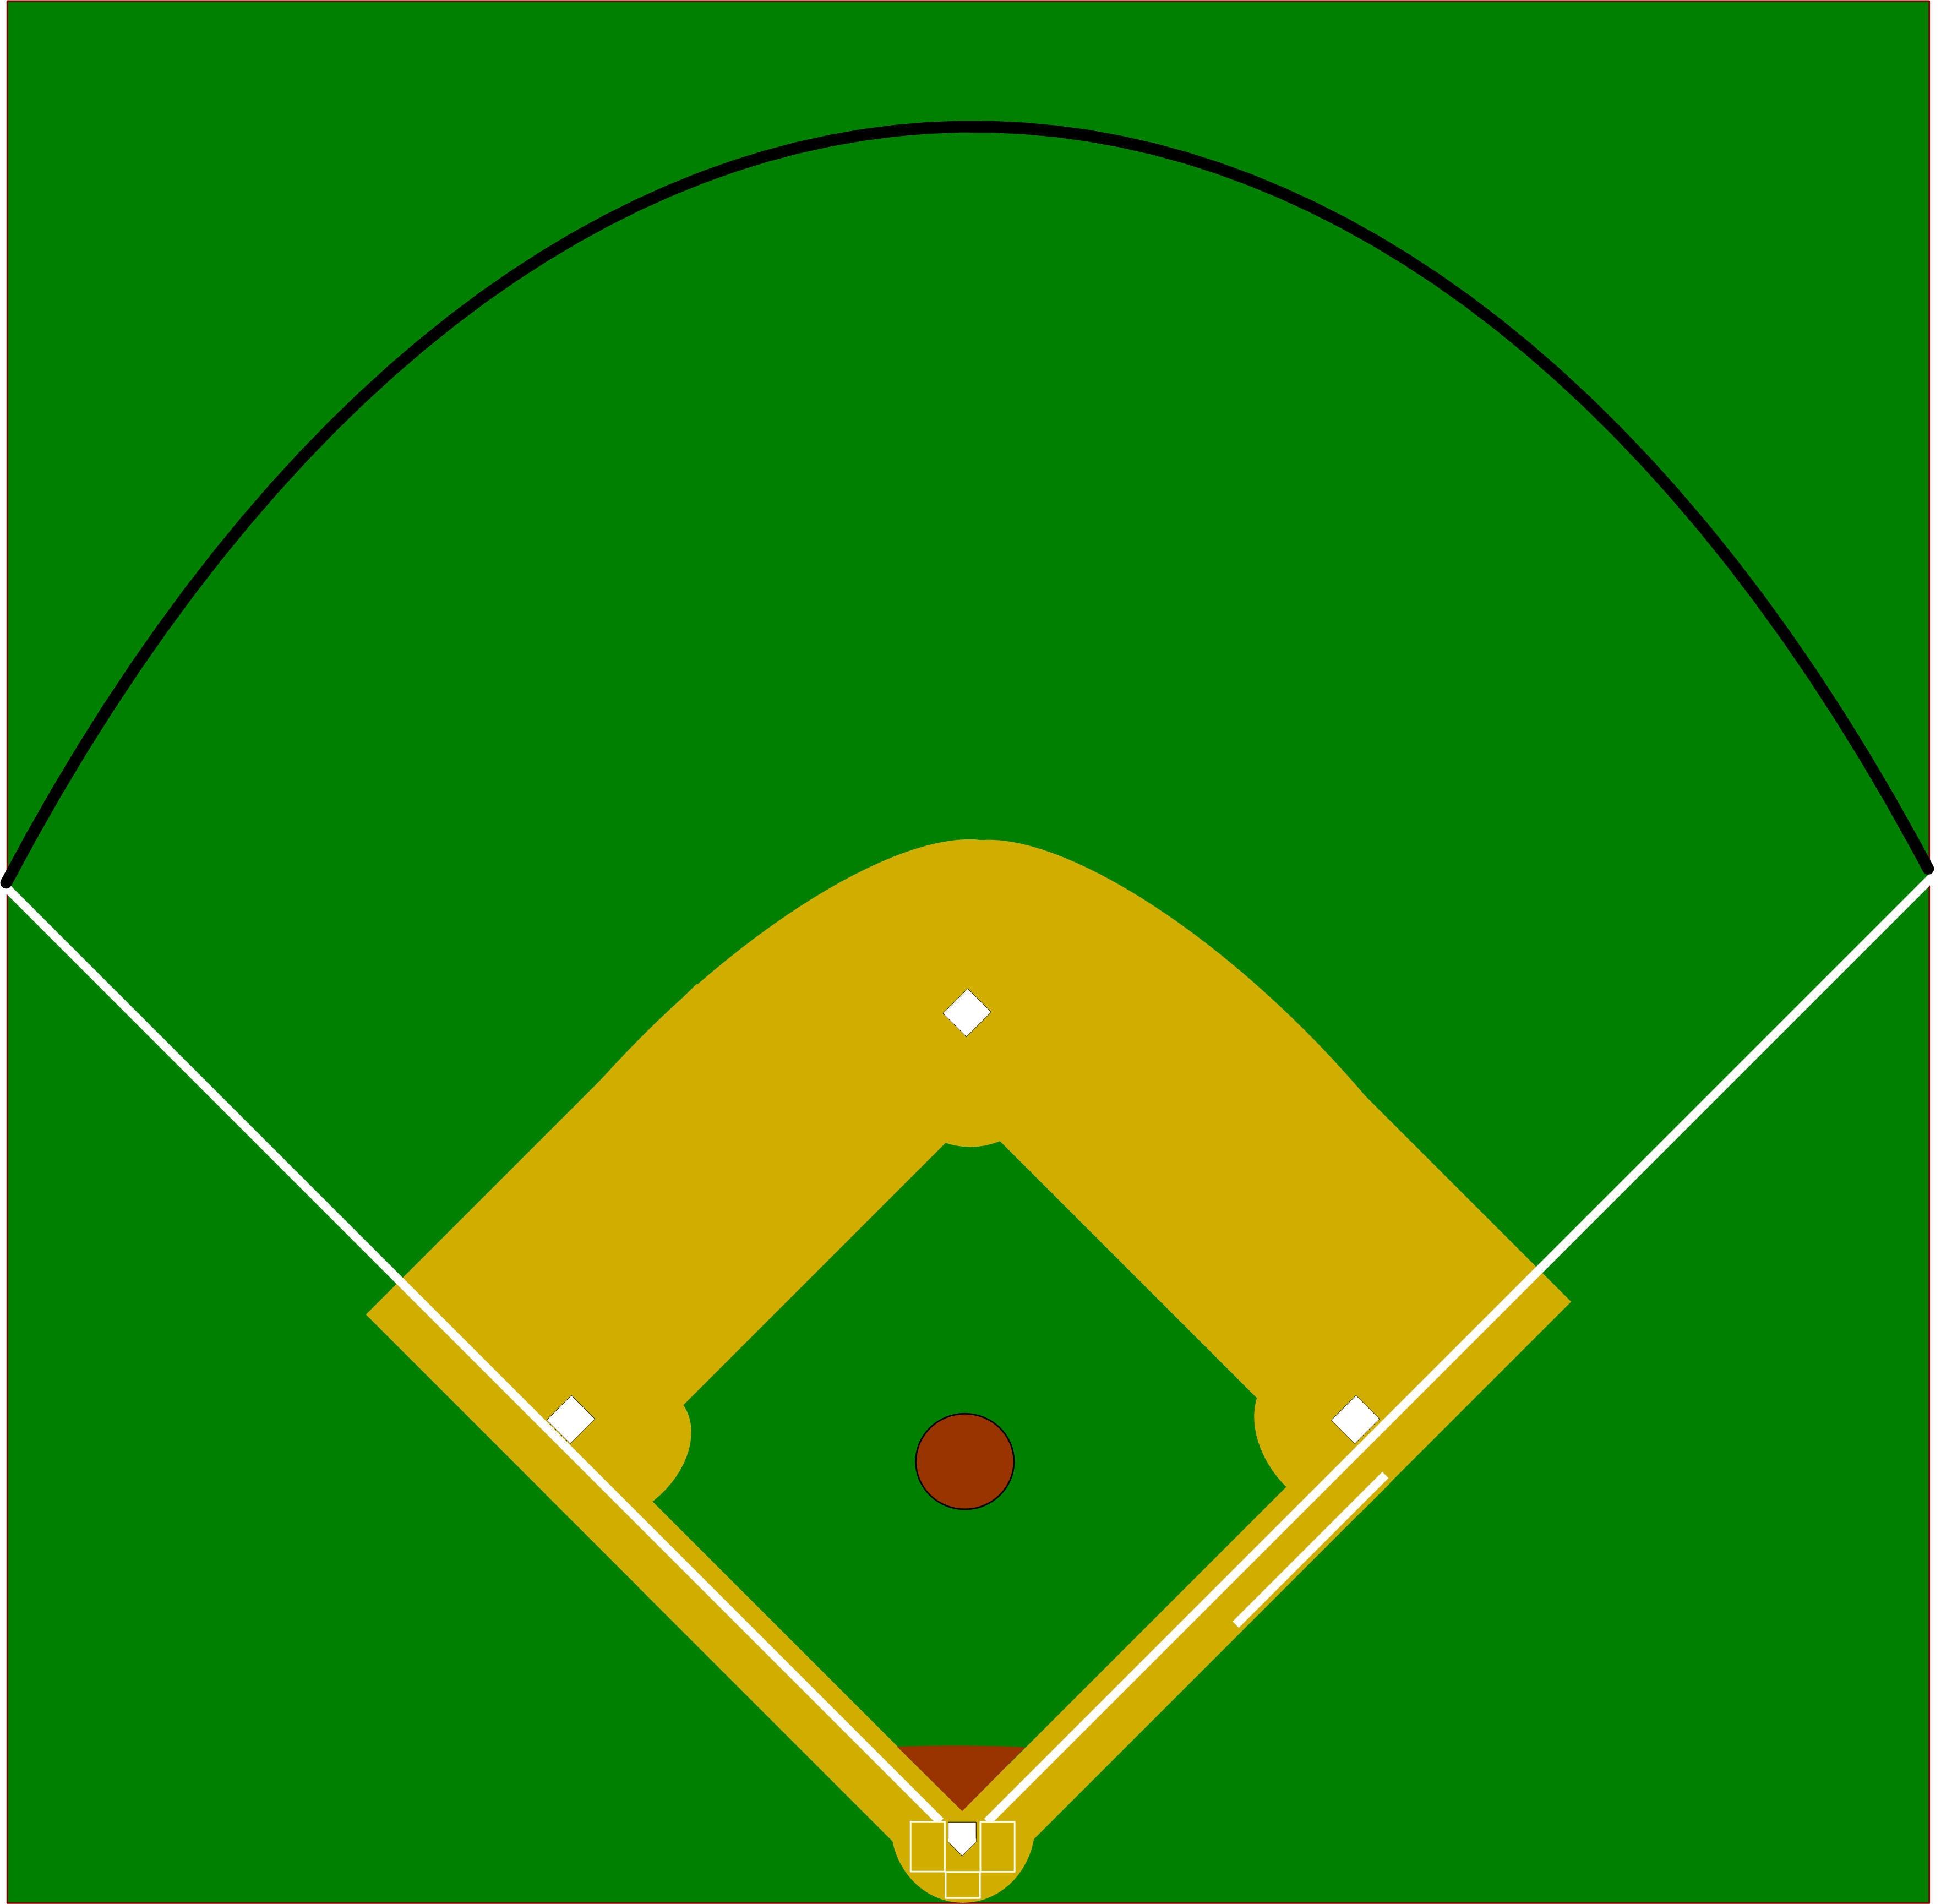 Free Printable Baseball Field Diagram